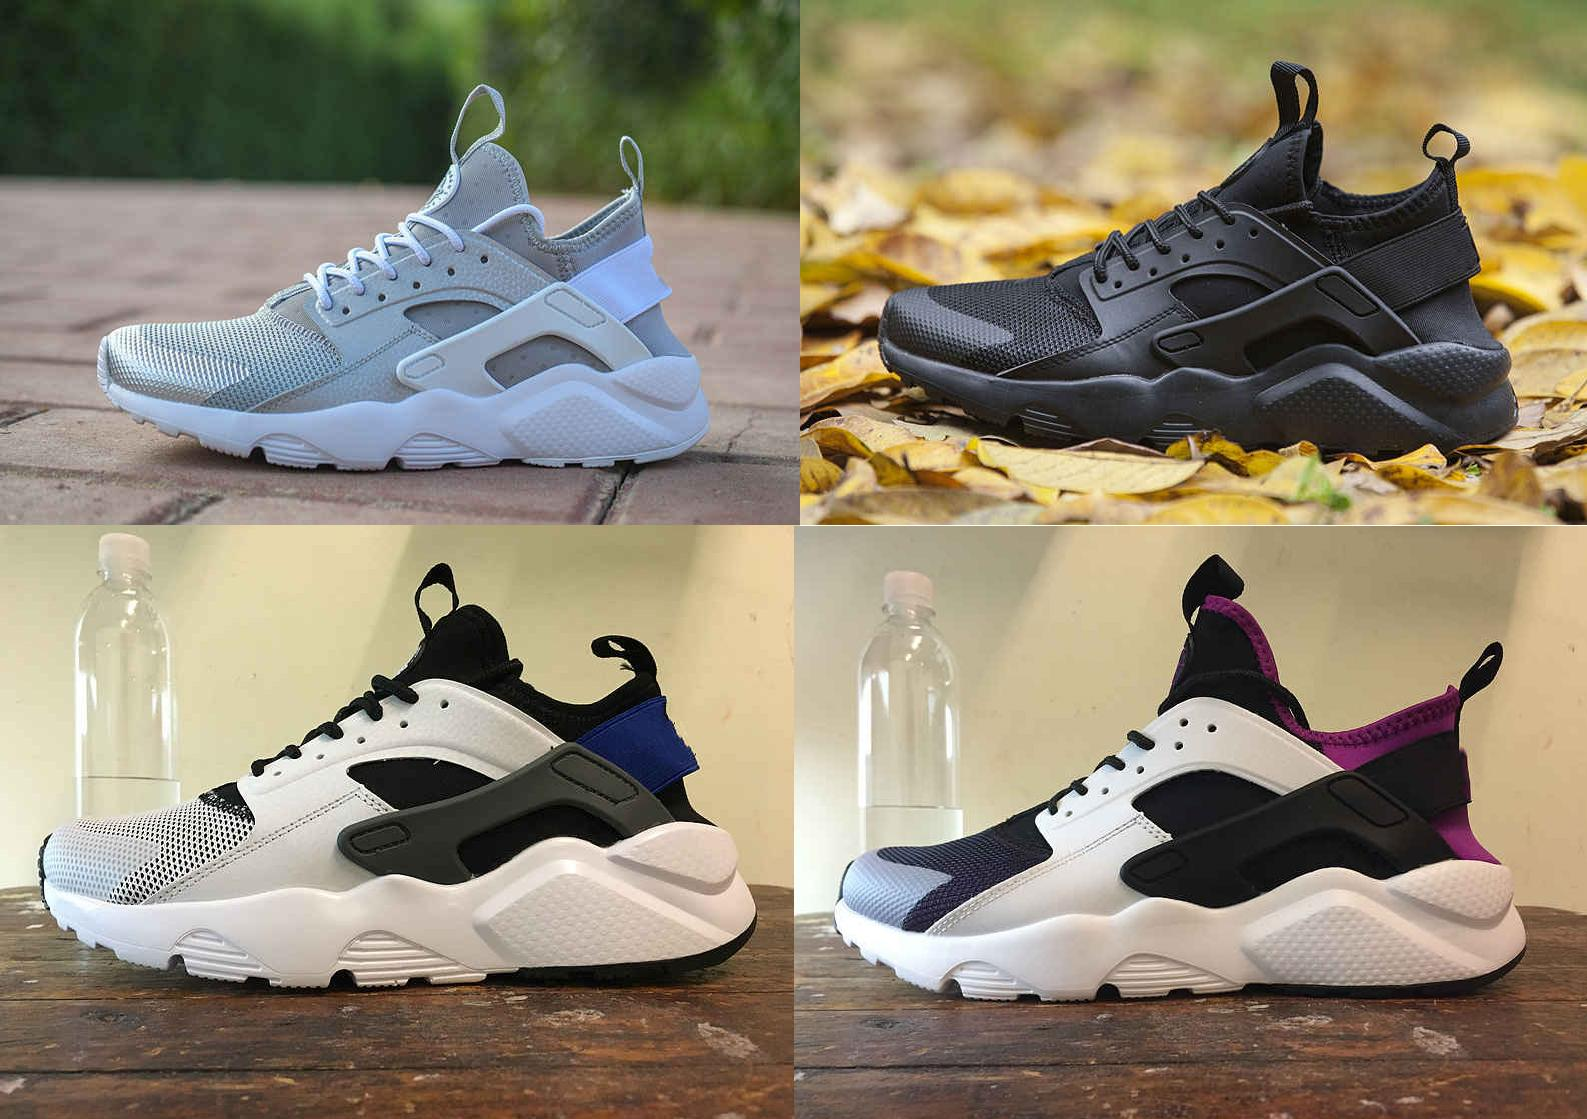 HOT VENTE CHEAP maille Huarache Run respirabilité Ultra ultra-léger des femmes des hommes chaussures de course Chaussures à Waling extérieur 36-45